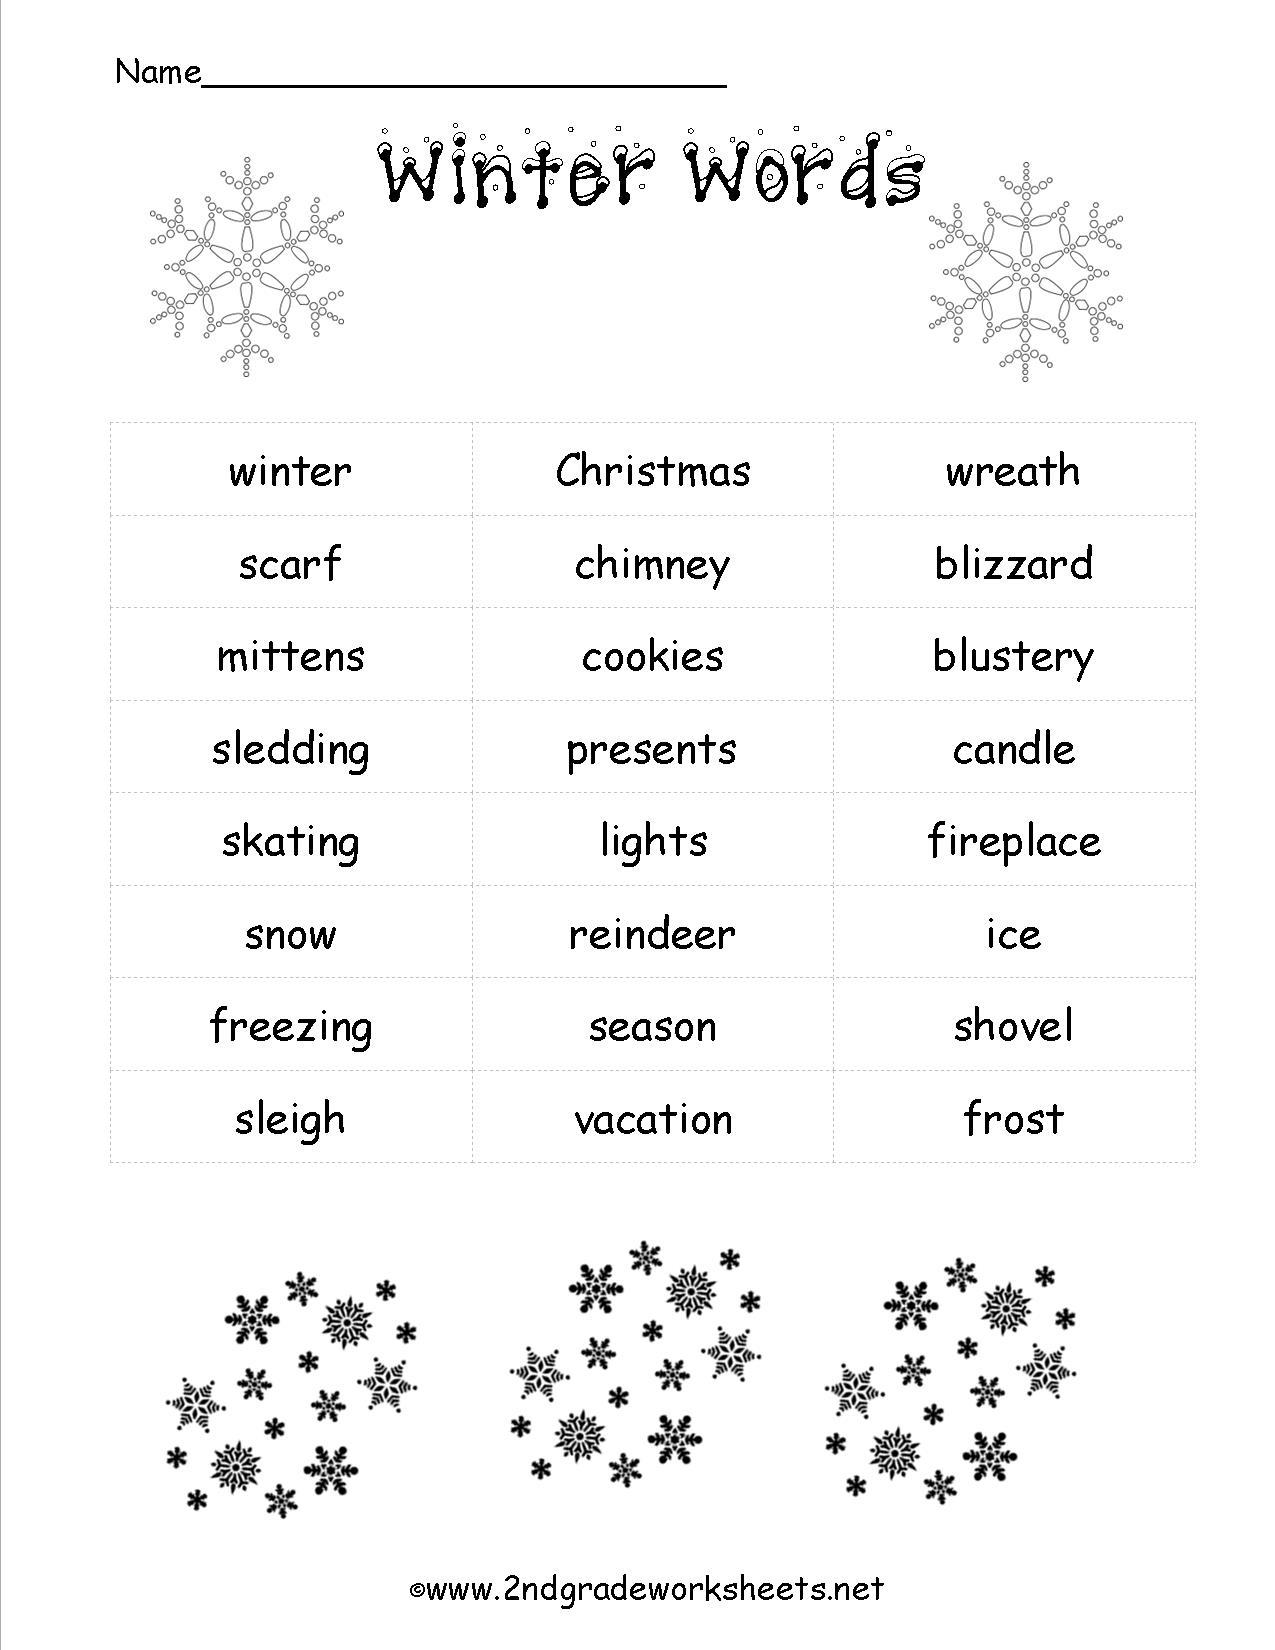 Christmas Worksheets And Printouts - Free Printable Holiday Worksheets